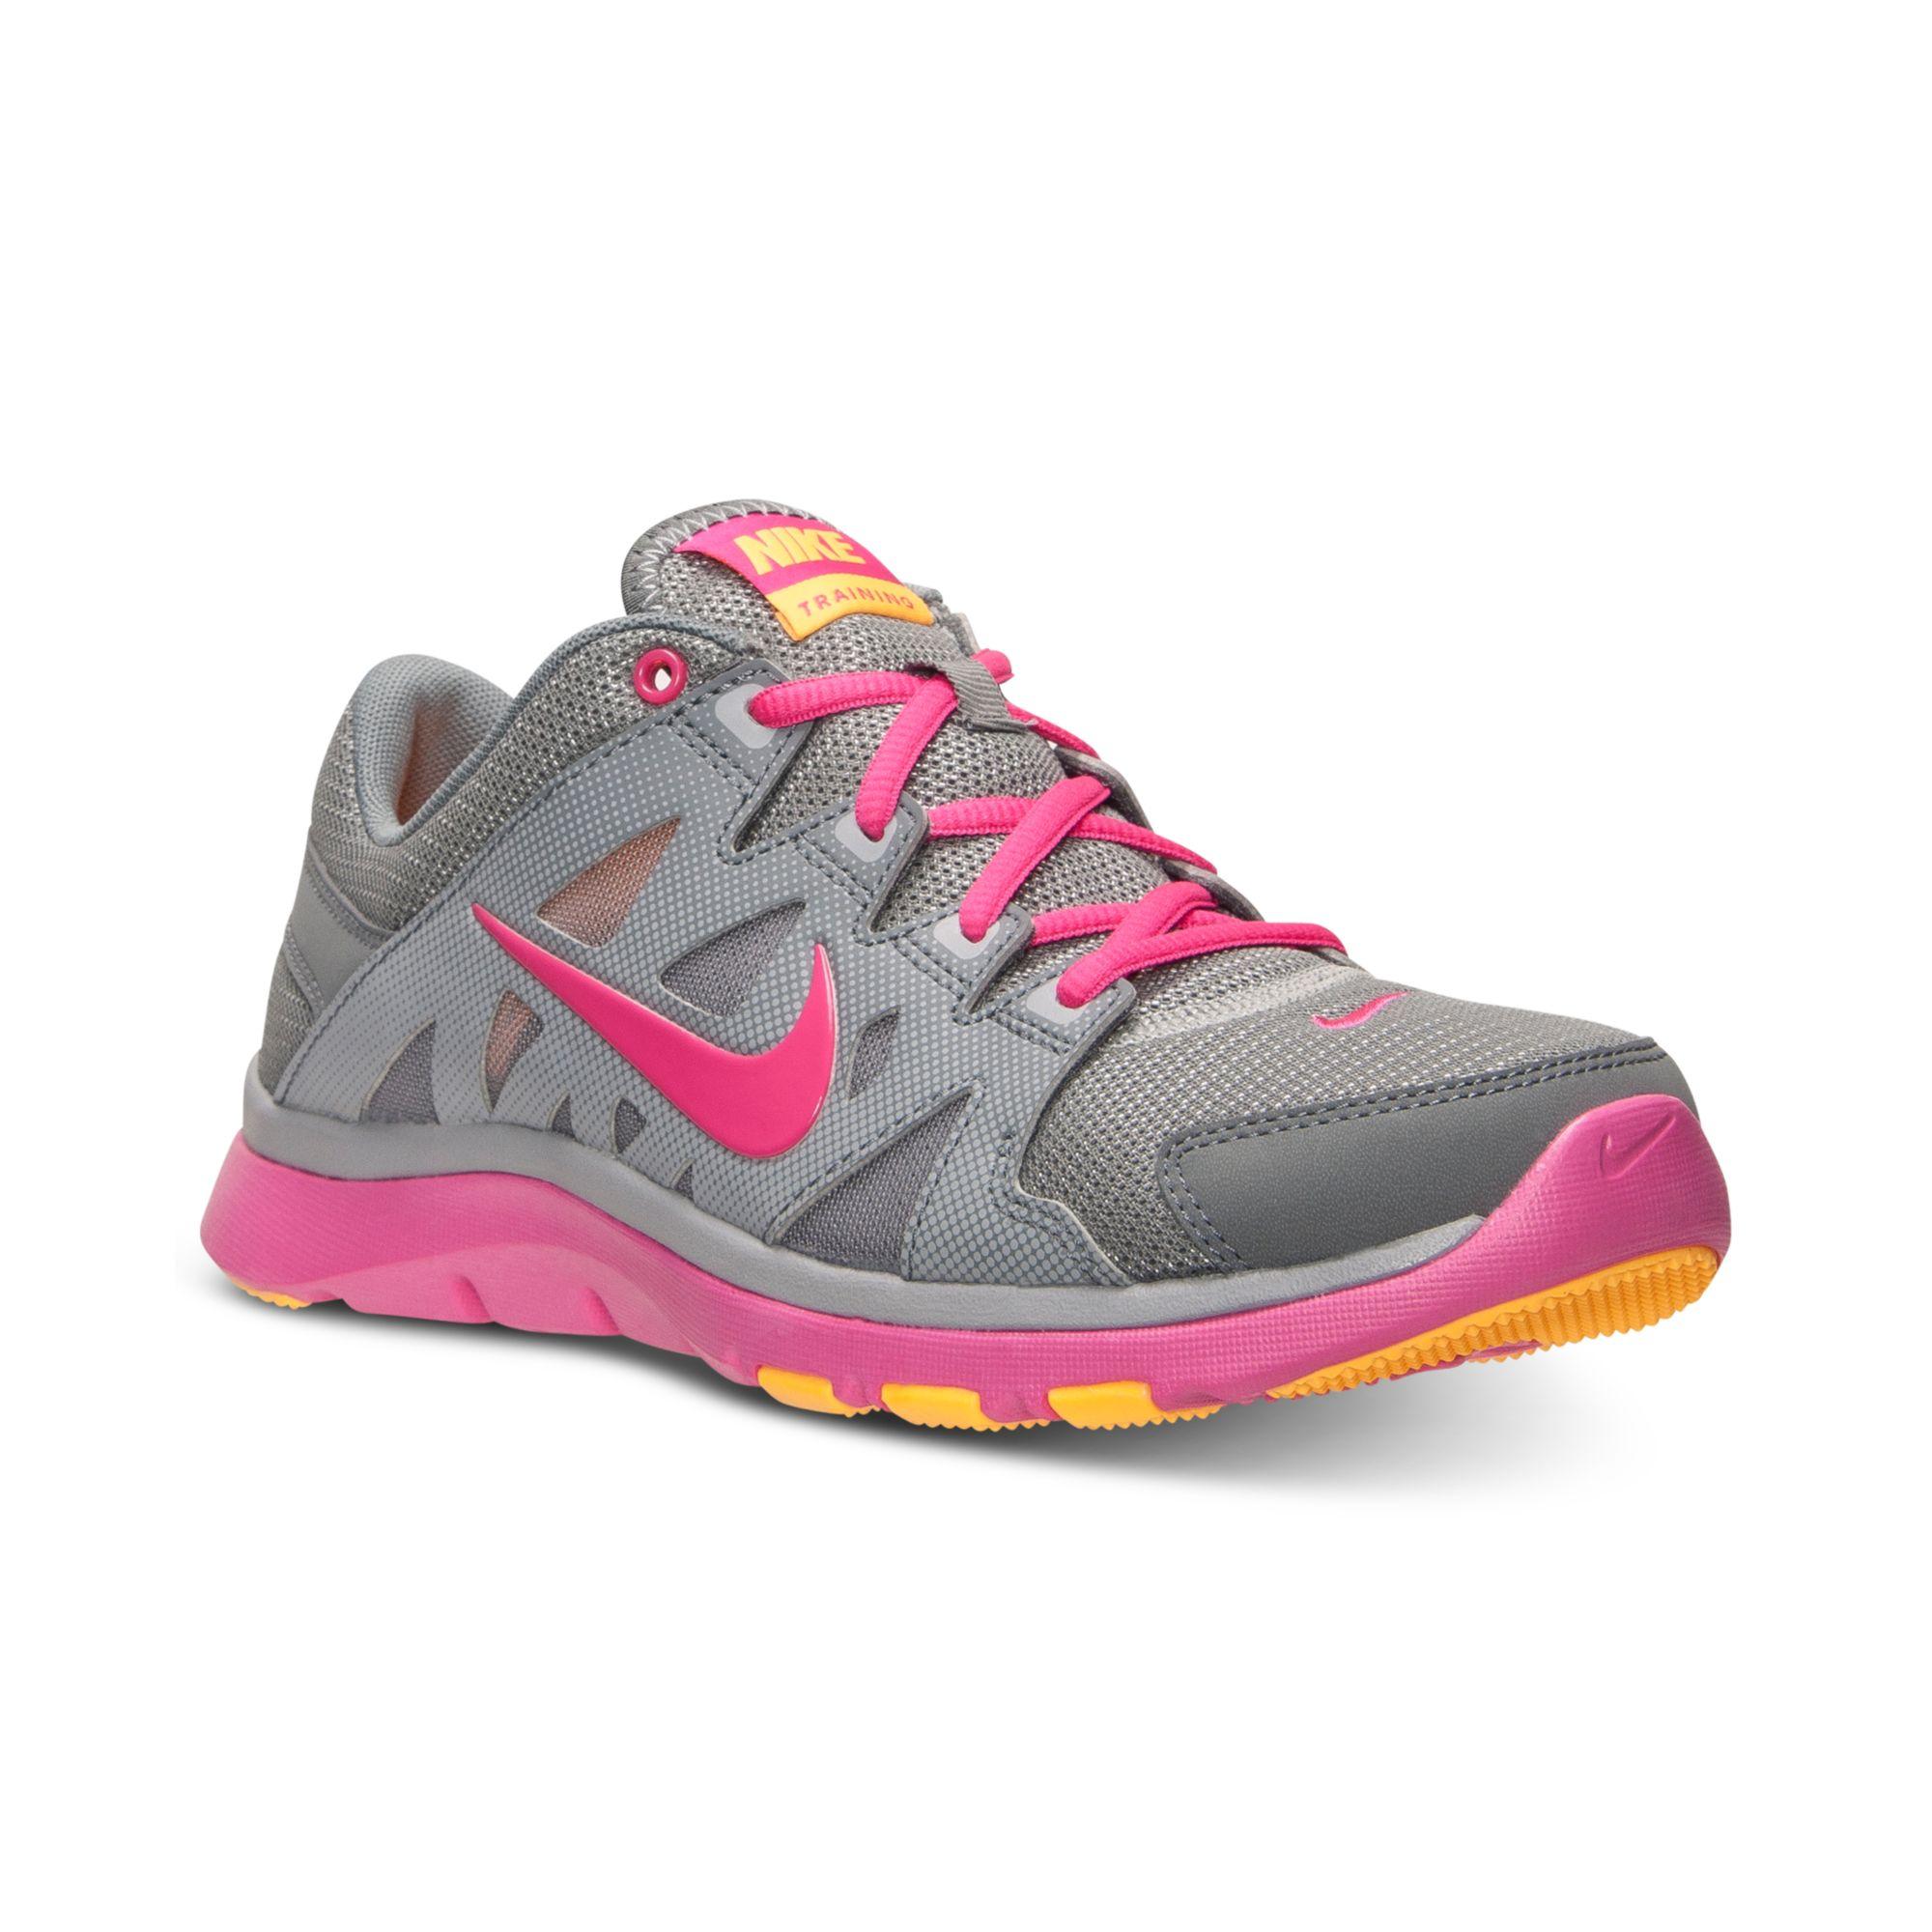 0ec258f129db8 Lyst - Nike Womens Flex Supreme Tr 2 Training Sneakers From Finish ...